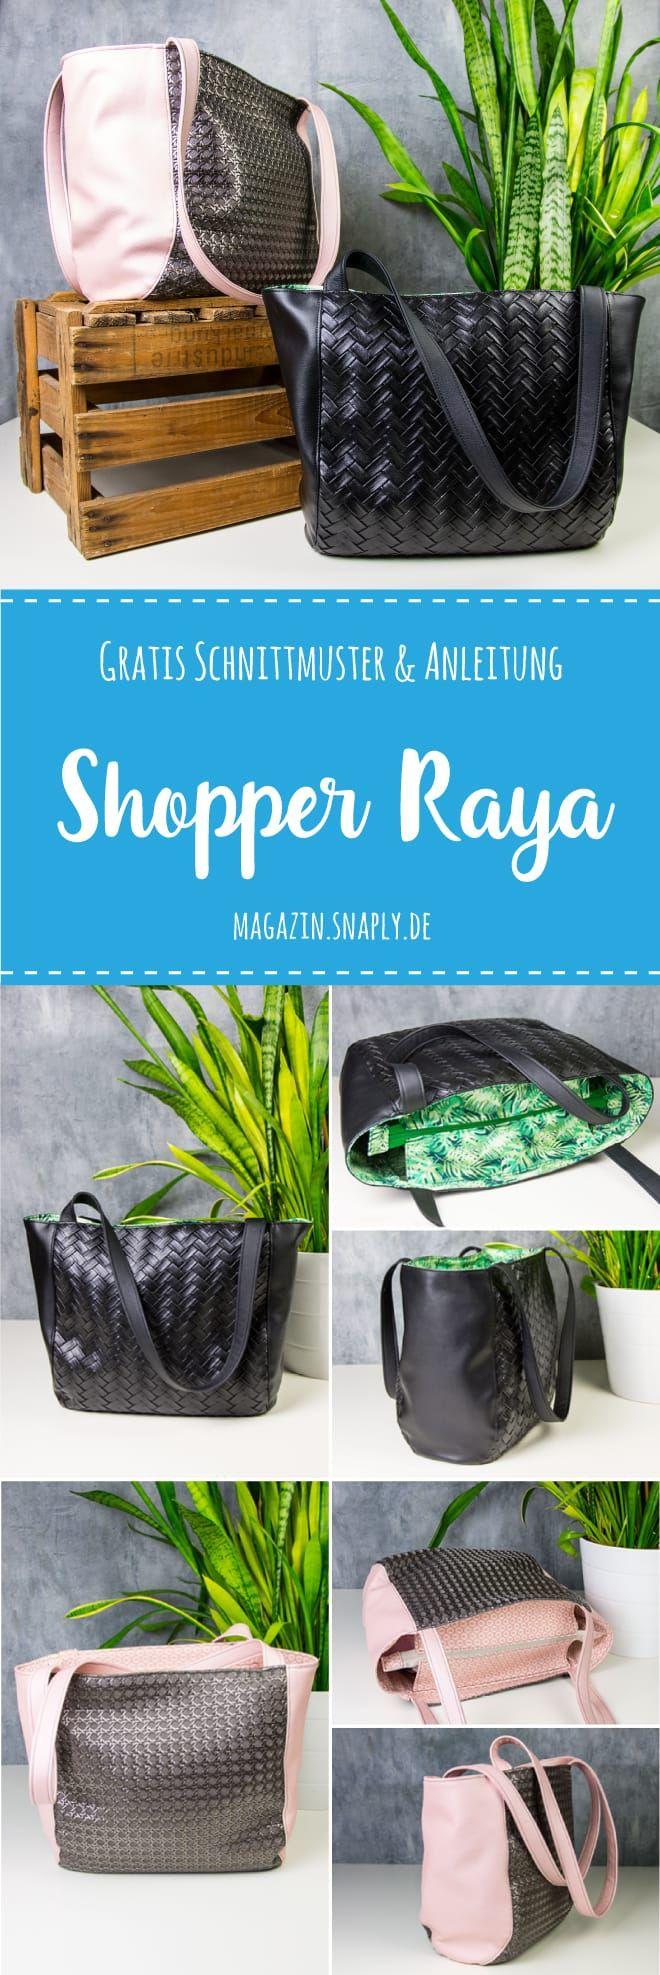 Shopper «Raya» – patrón de costura e instrucciones de costura gratis – Snaply Magazin DE  – Bolsa